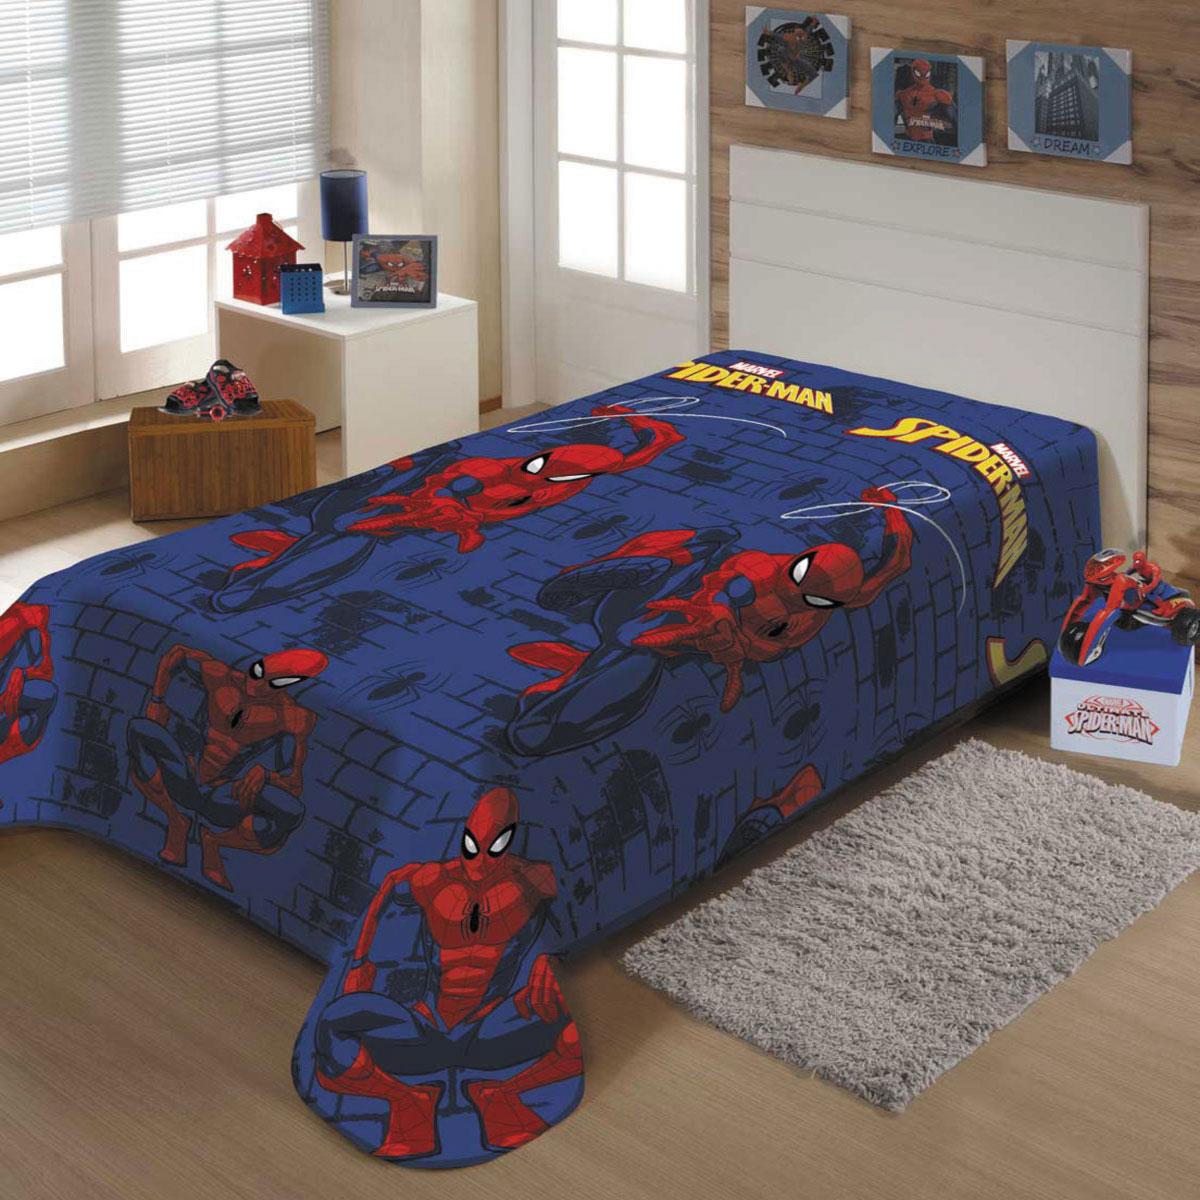 Cobertor Infantil Spider Man Teia Manta Fleece Homem Aranha Jolitex